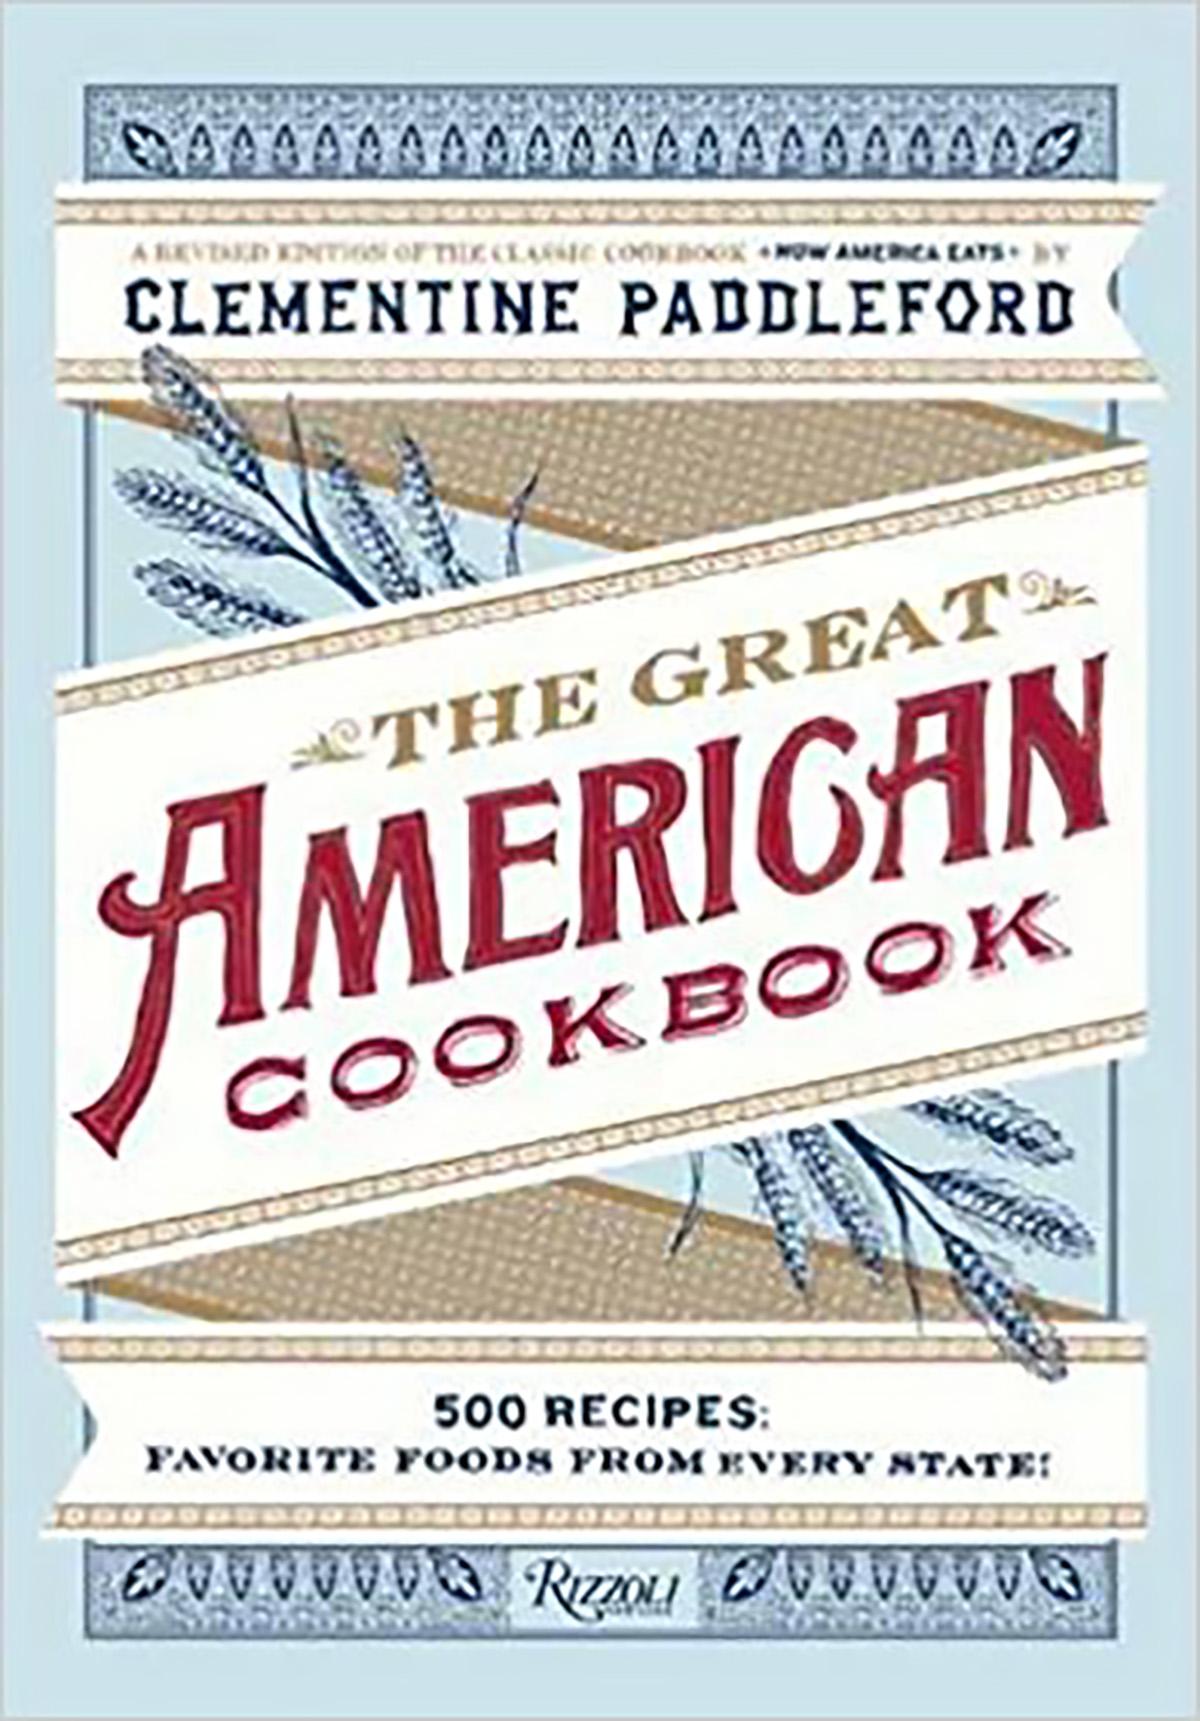 KA_GreatAmericanCookbook.jpg